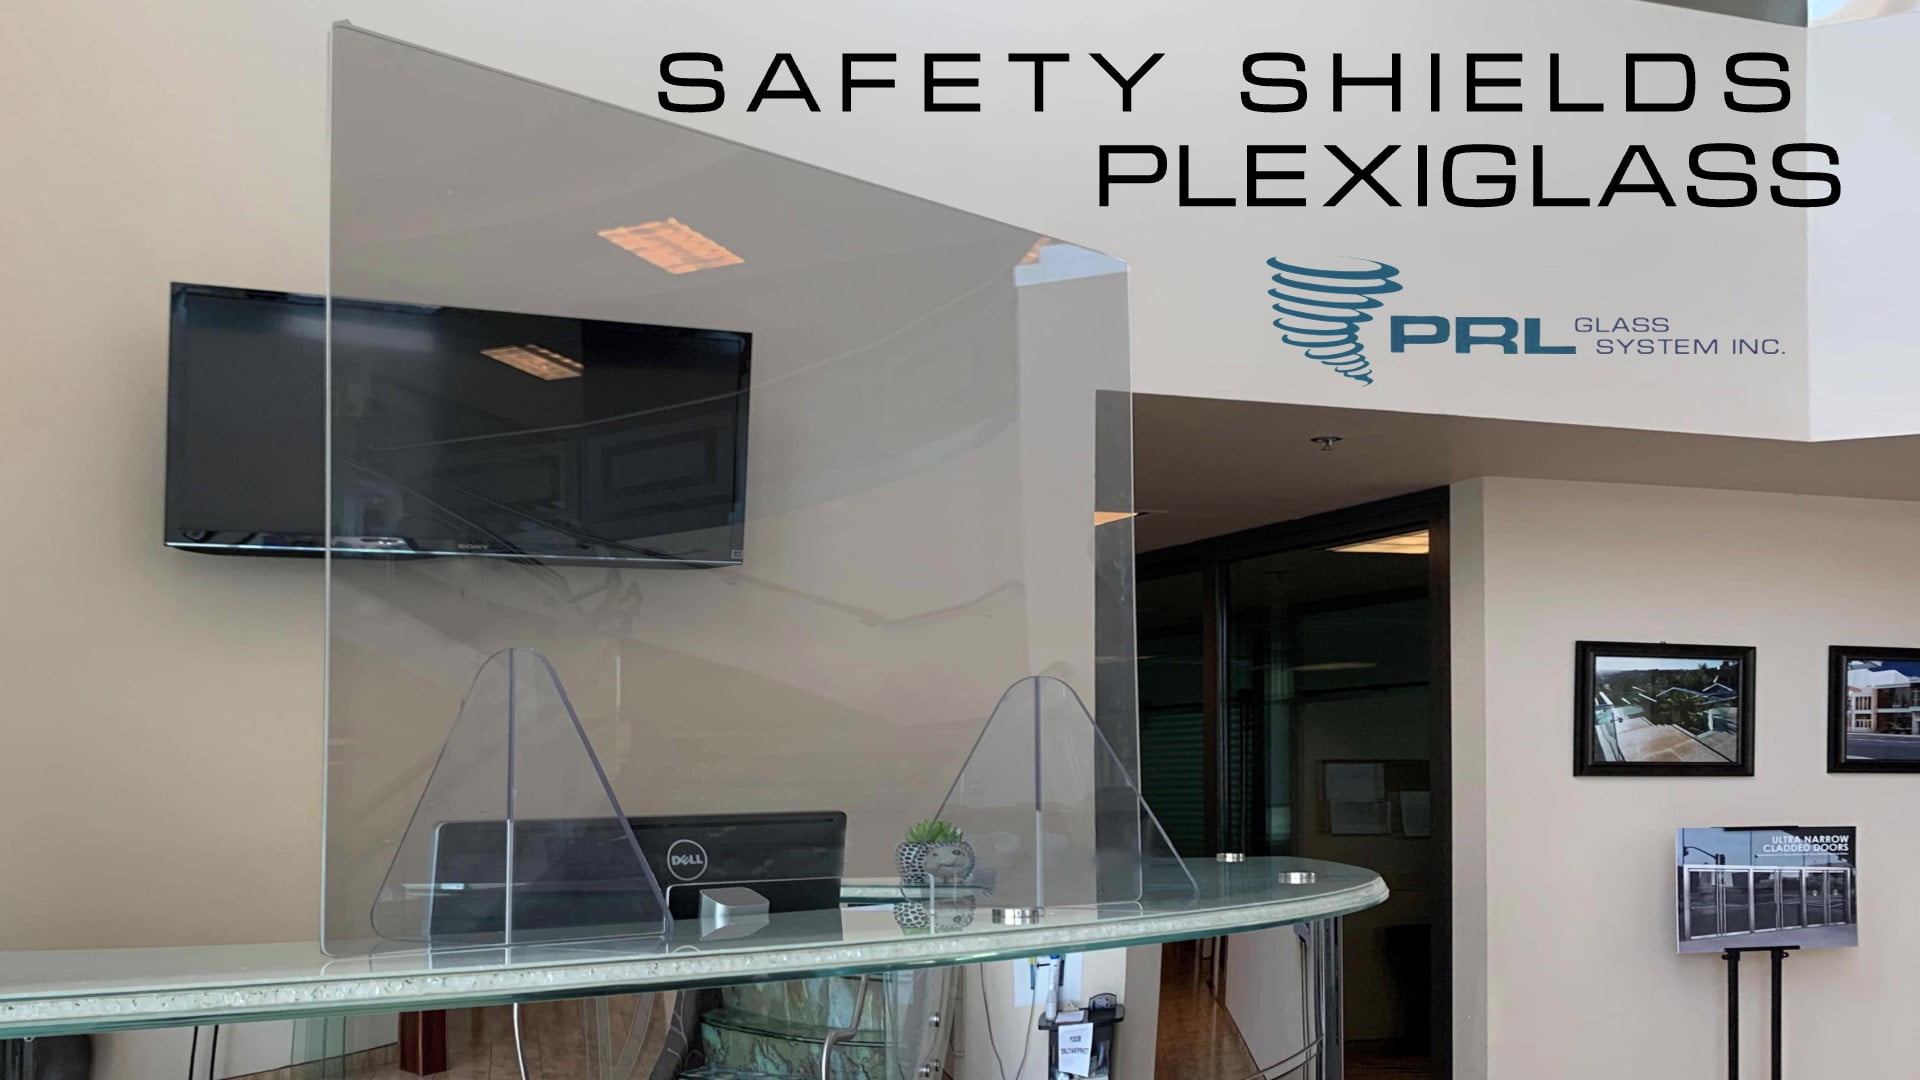 Plexiglass Shields Video